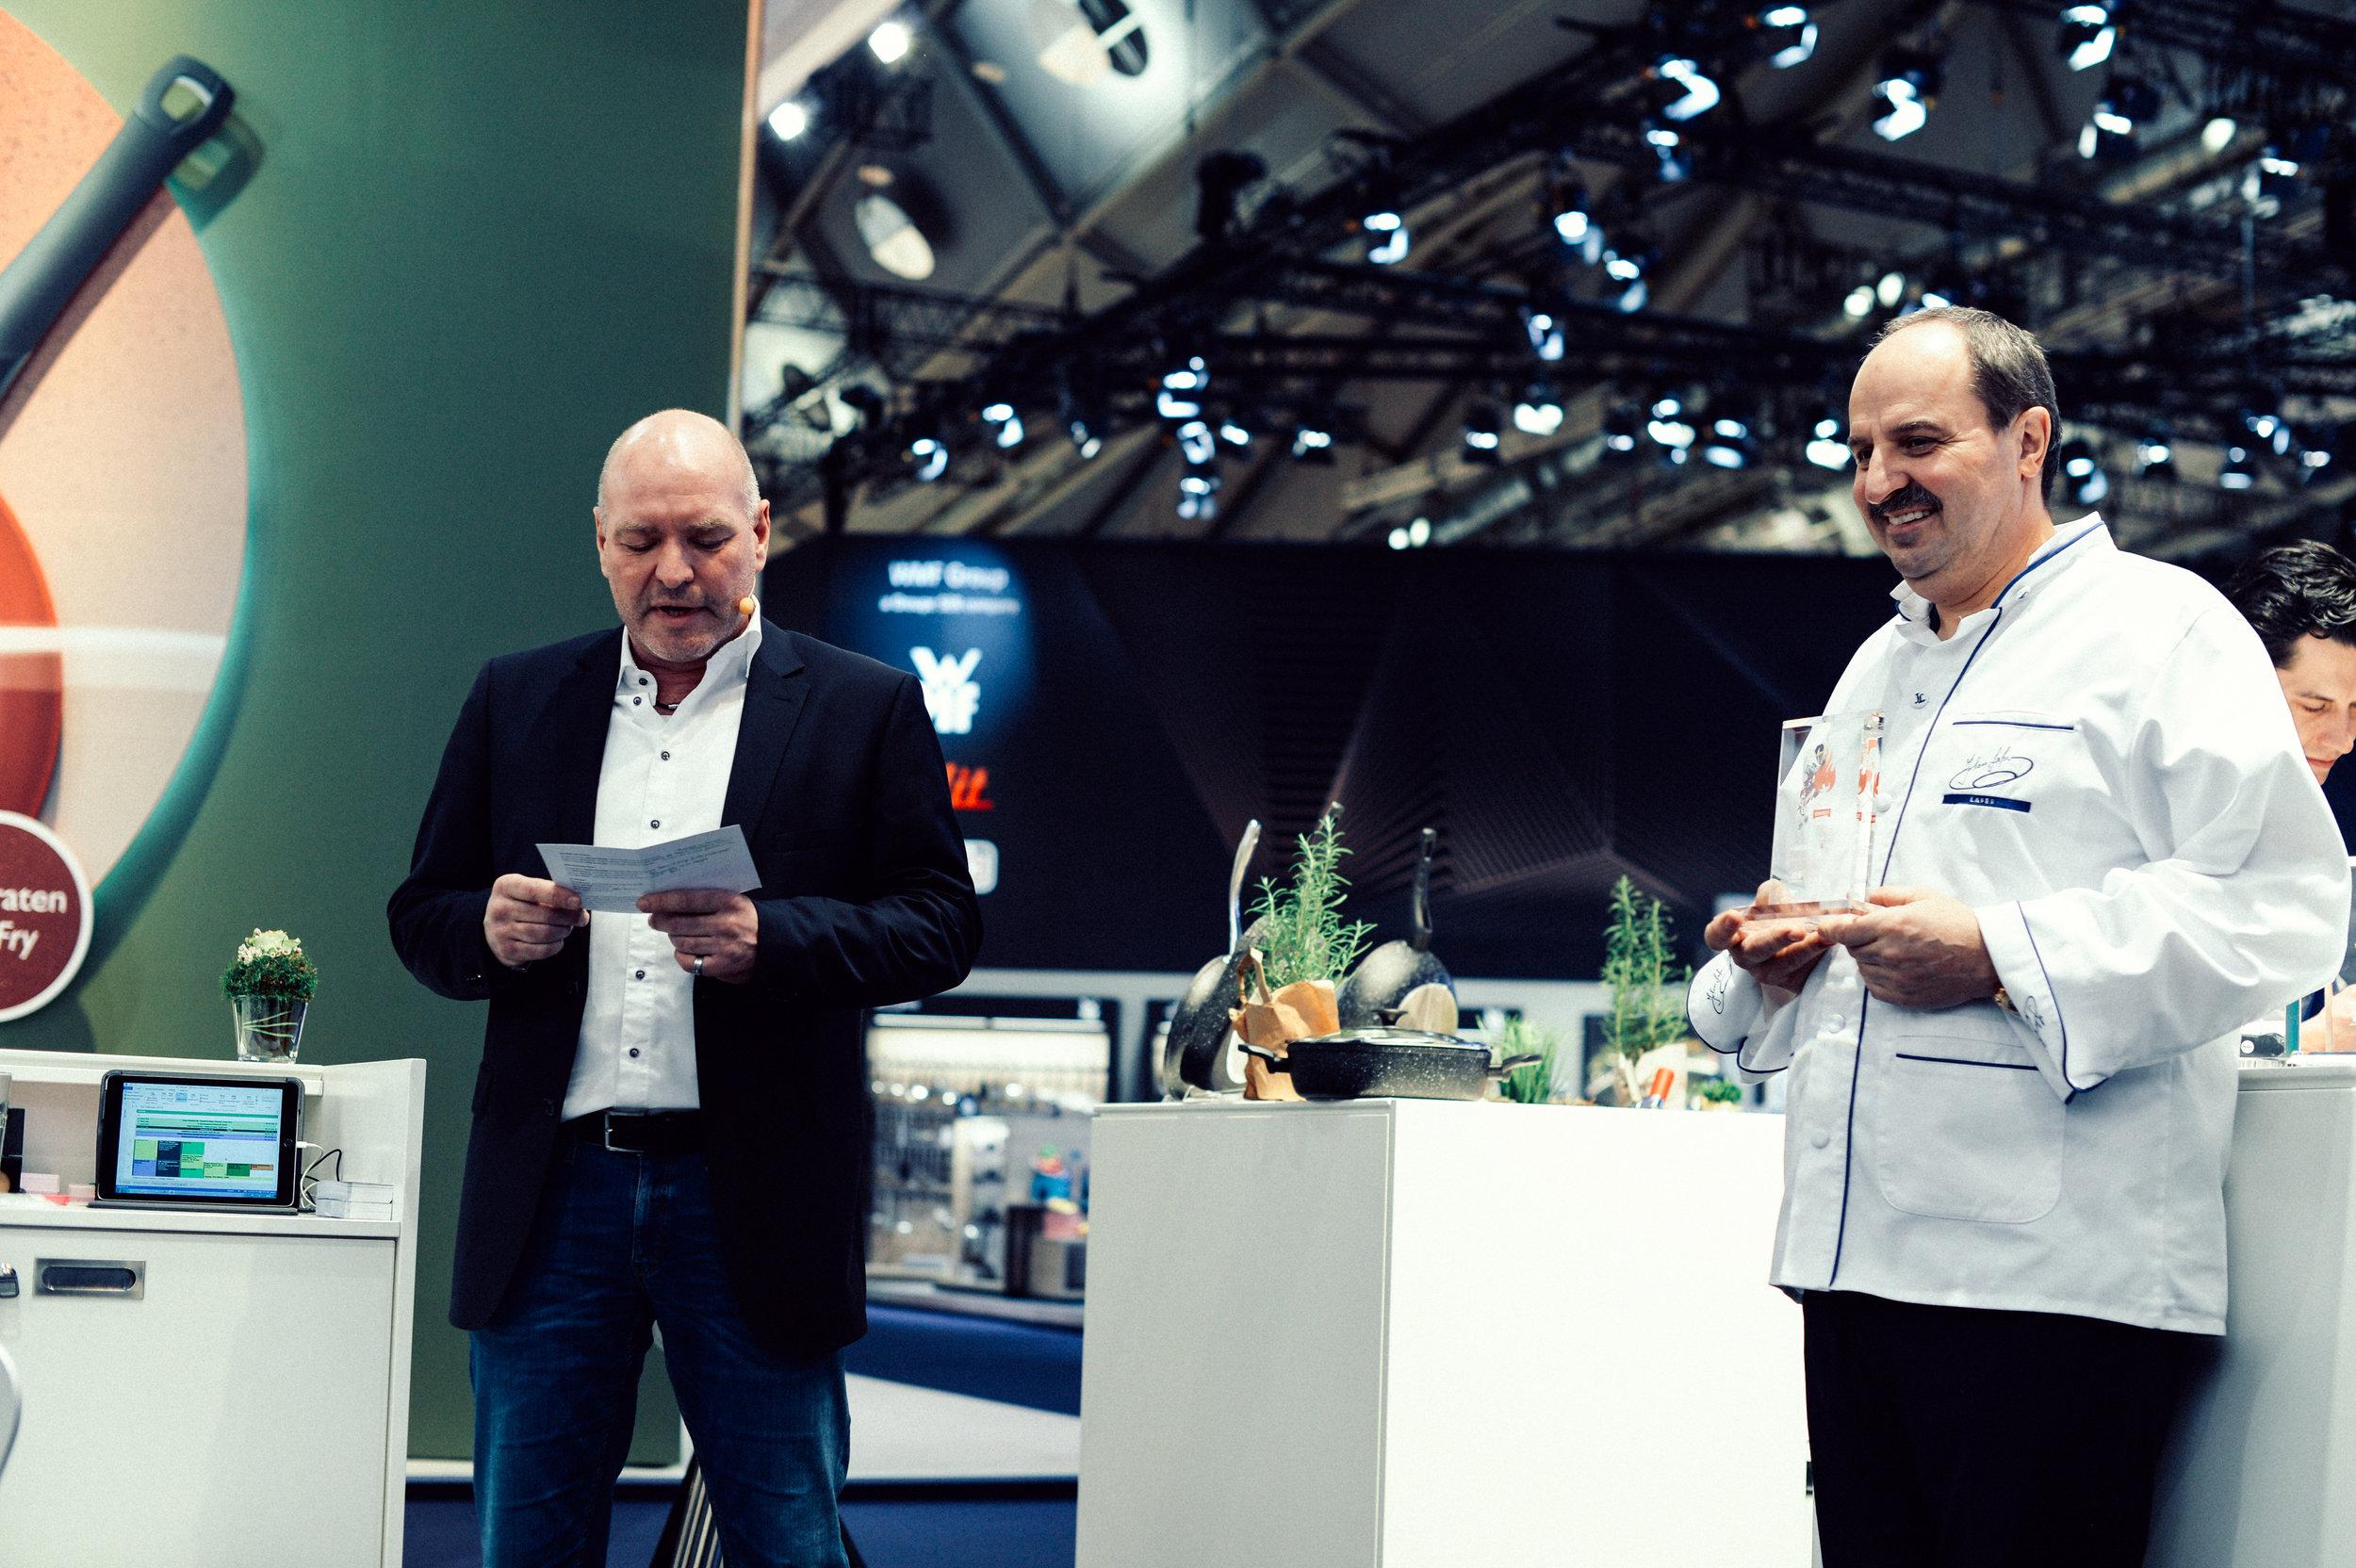 german_food_blog_contest-10.jpg